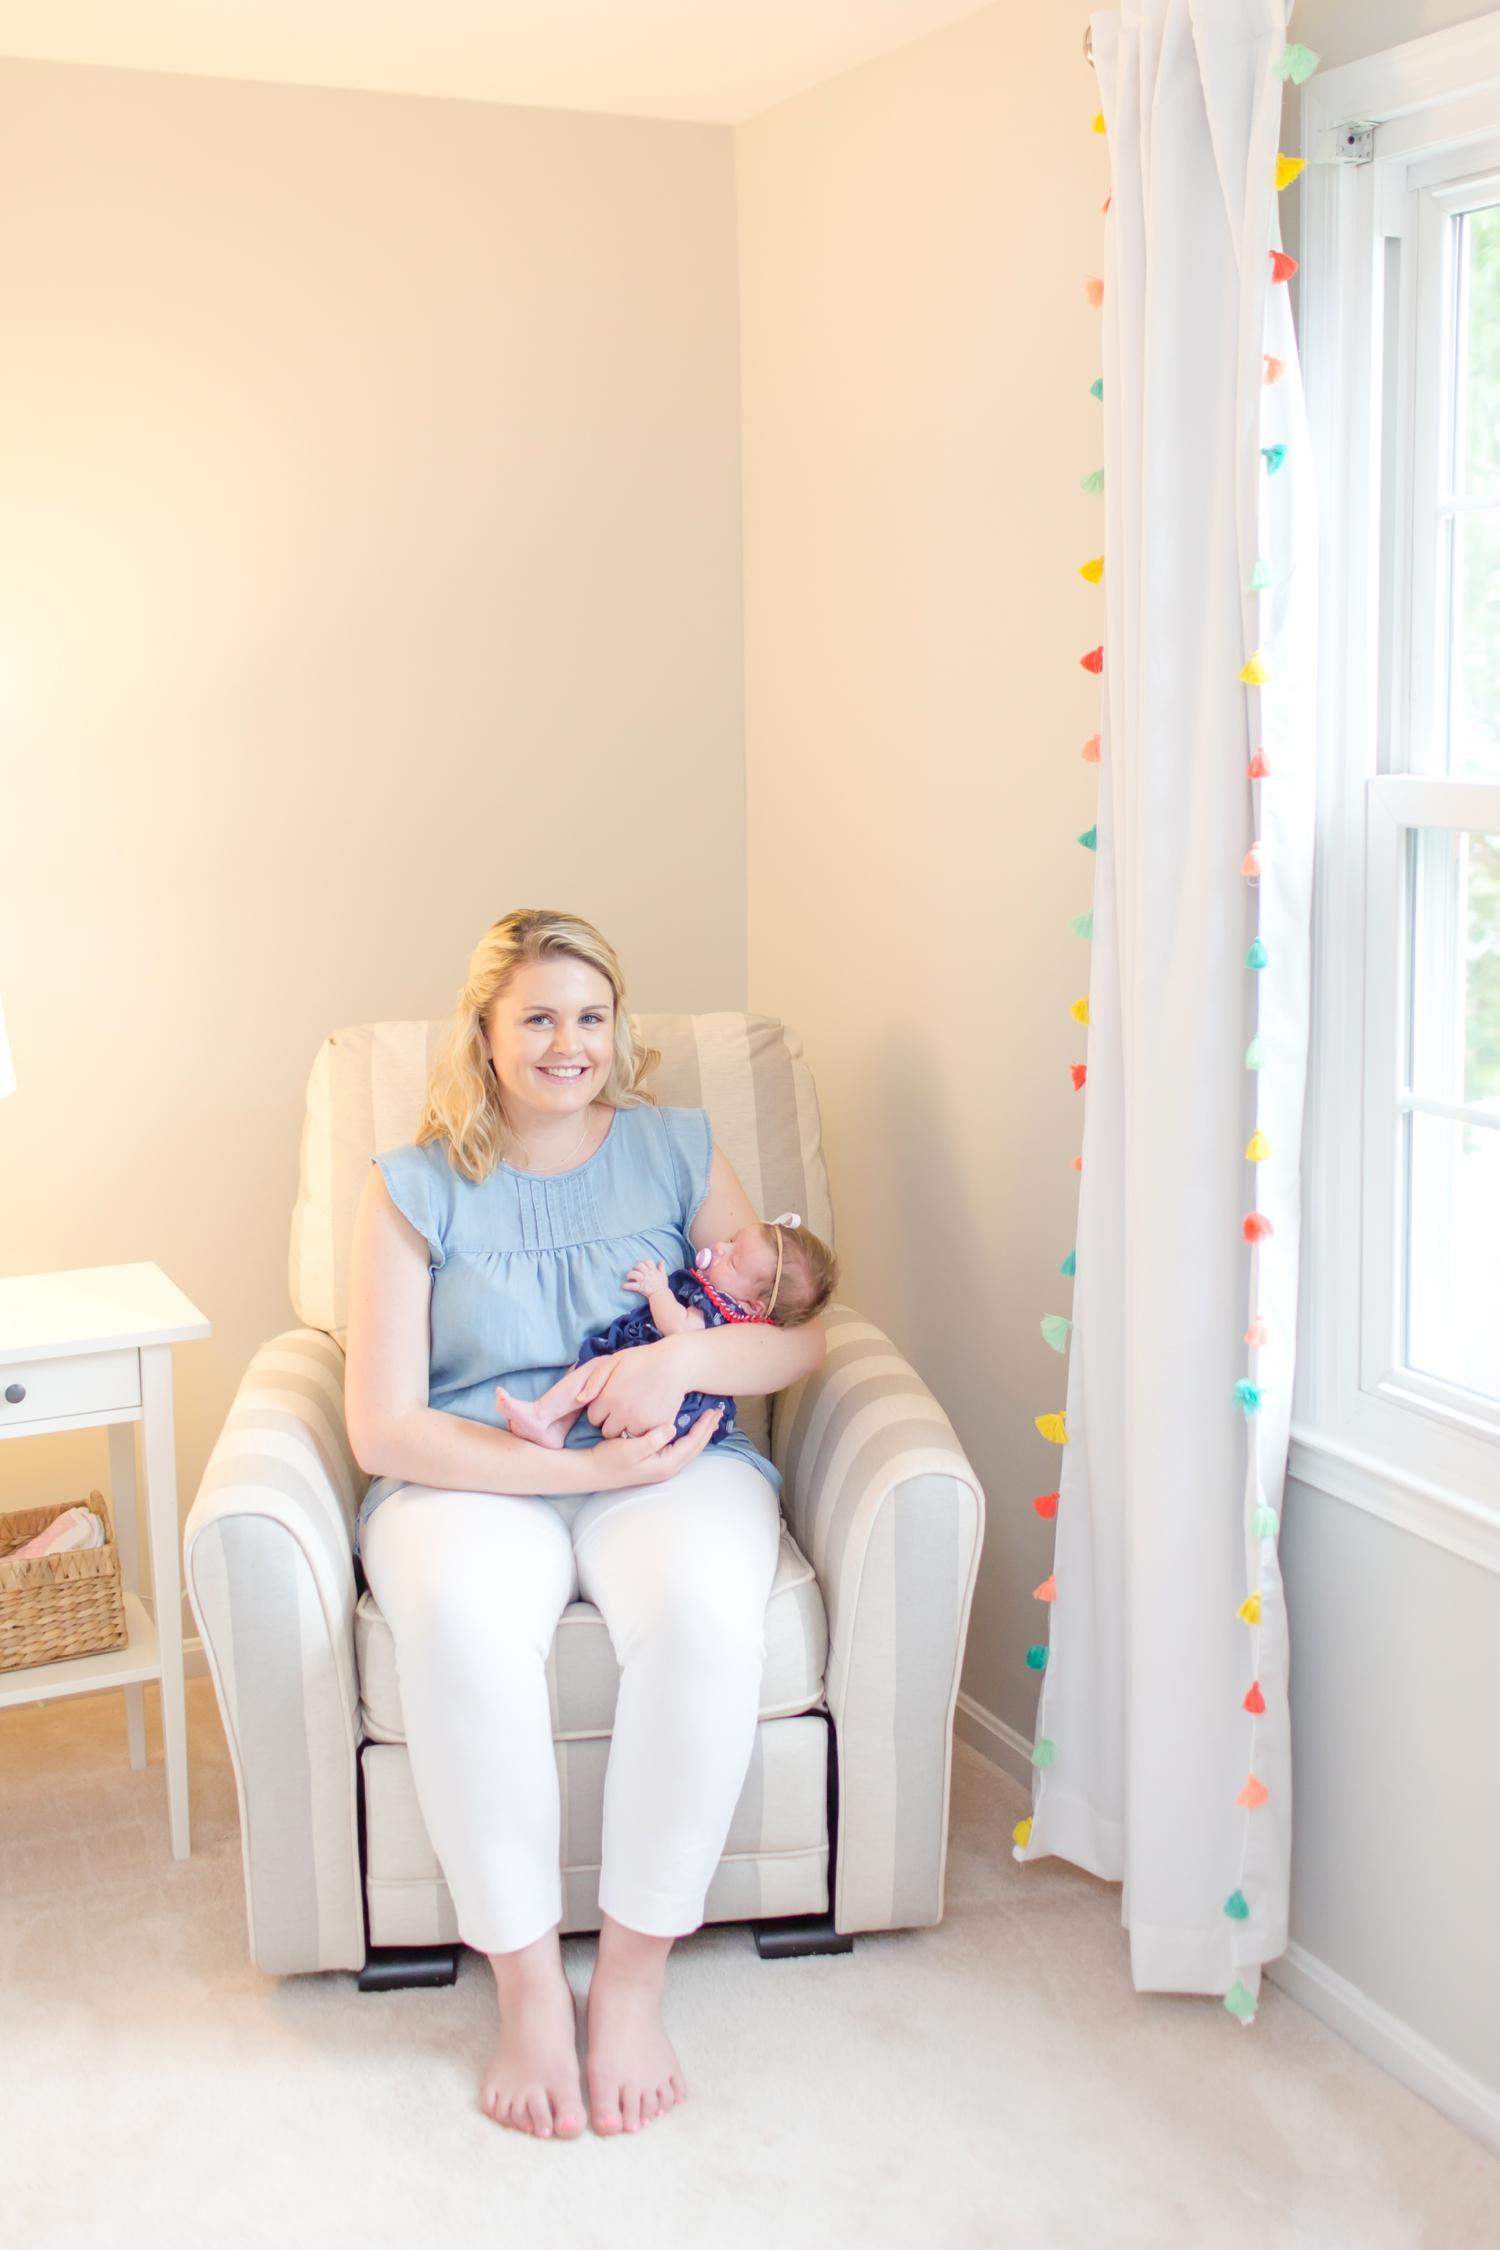 Miano Newborn-140_anna grace photography newborn photography baltimore maryland newborn and family photographer photo.jpg